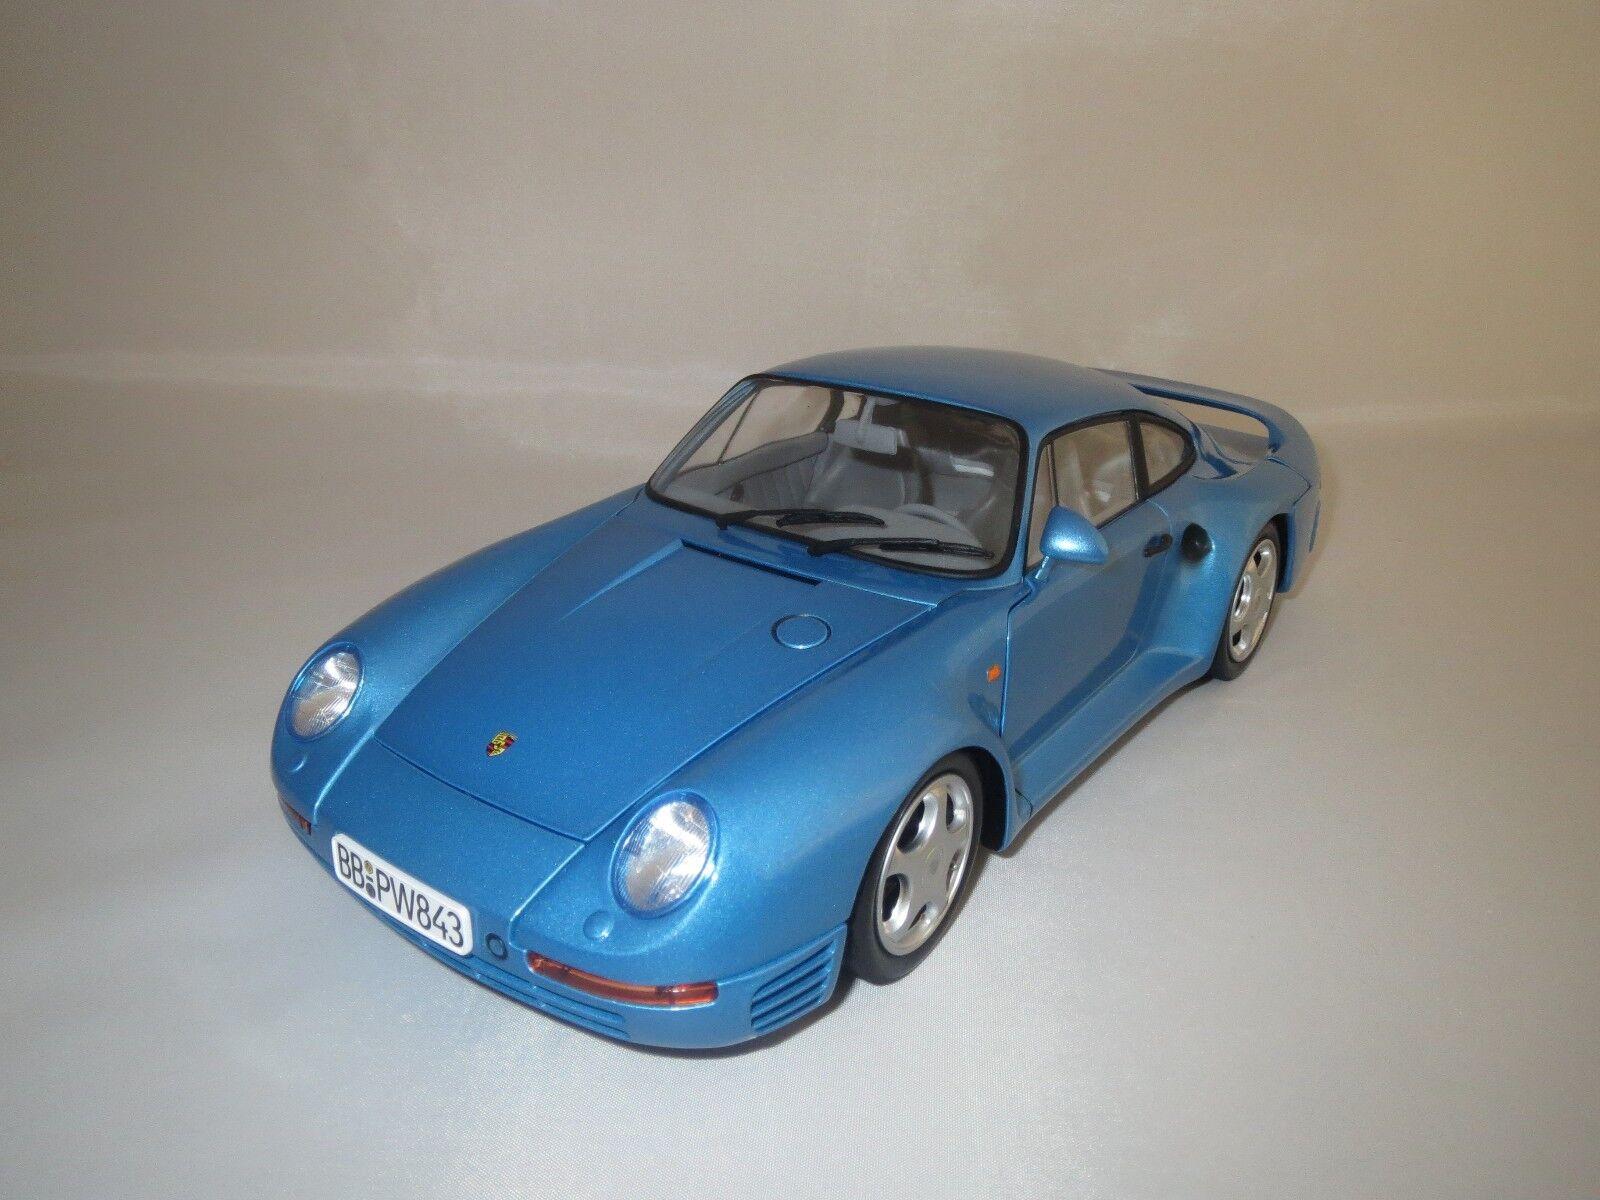 Motorbox Exoto Porsche 959 (bleu-Met.) 1 18 sans emballage